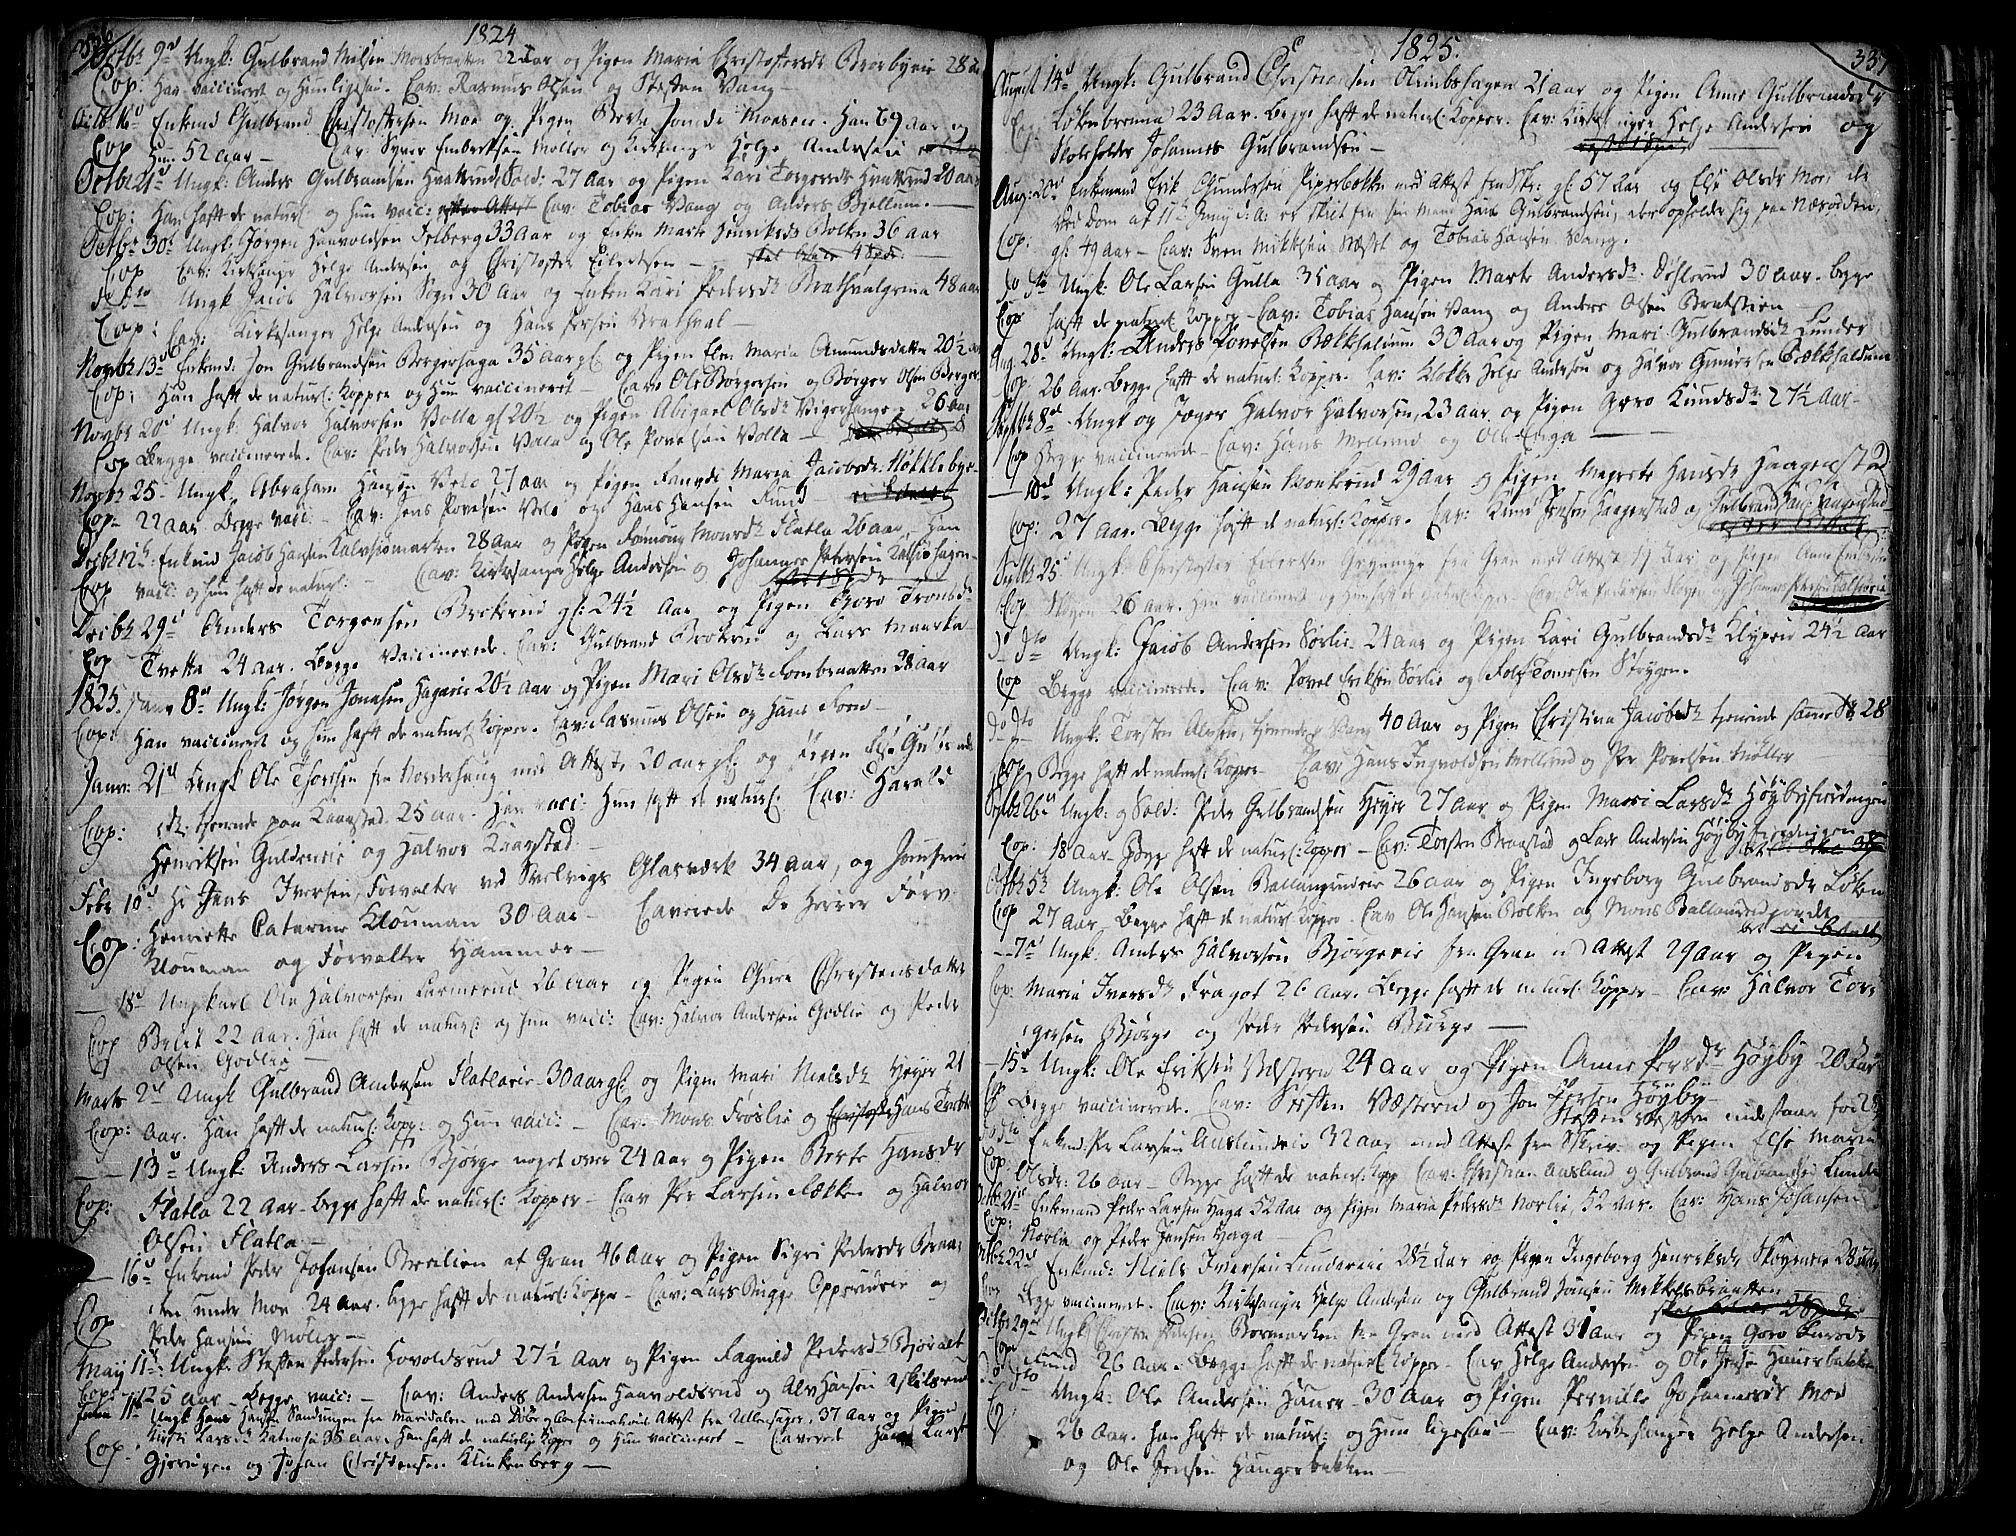 SAH, Jevnaker prestekontor, Ministerialbok nr. 4, 1800-1861, s. 336-337